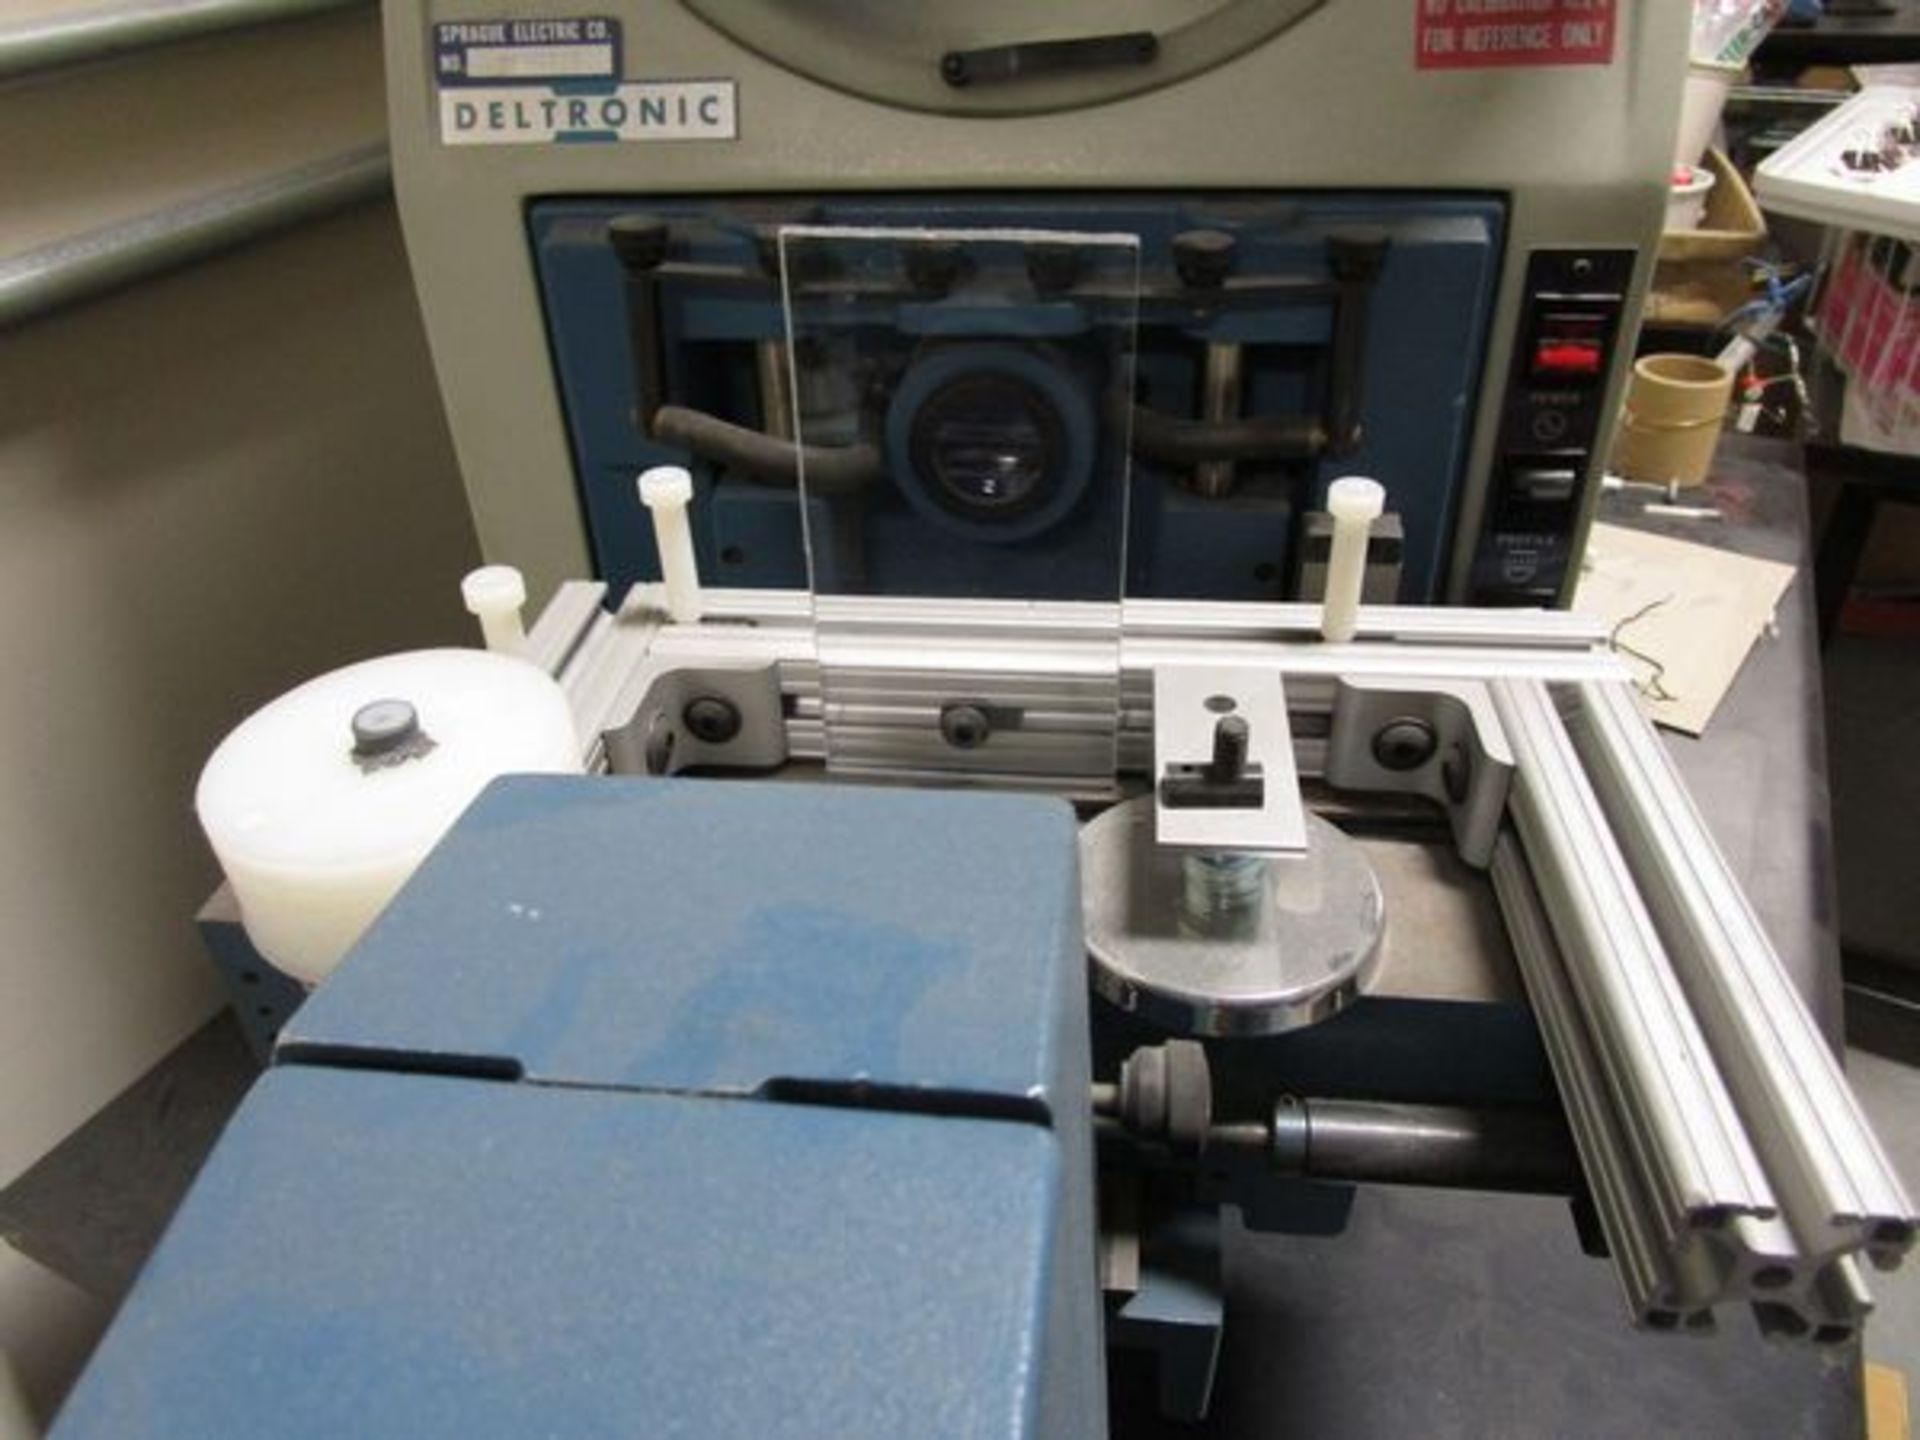 "Deltronics Imagemaster 330A-DEC Optical Comparator s/n S180908, 13"", Heidenhain Control - Image 4 of 5"